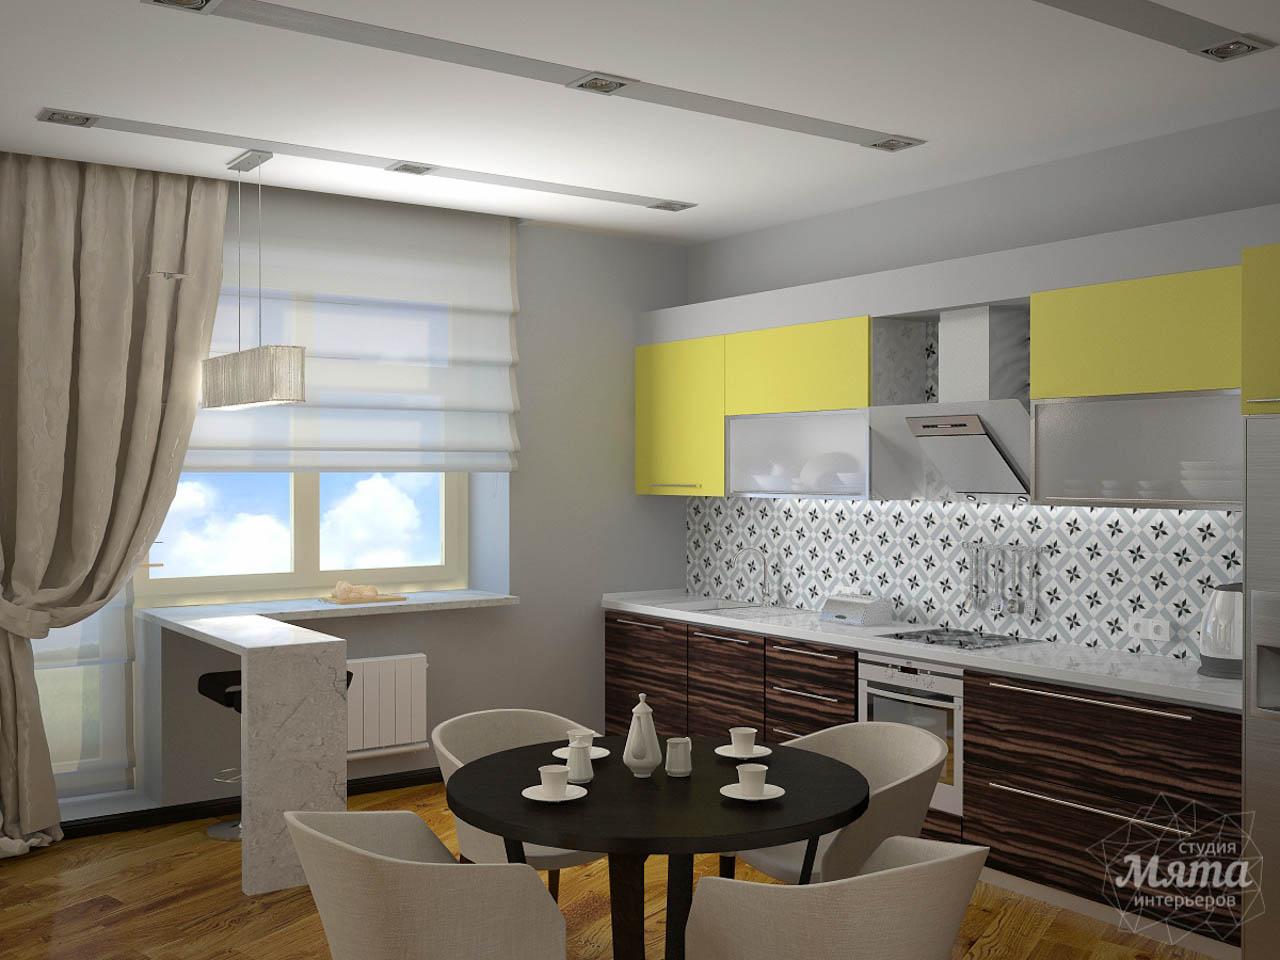 Дизайн проект интерьера коттеджа  в стиле минимализм по ул. Барвинка 15 img198765559